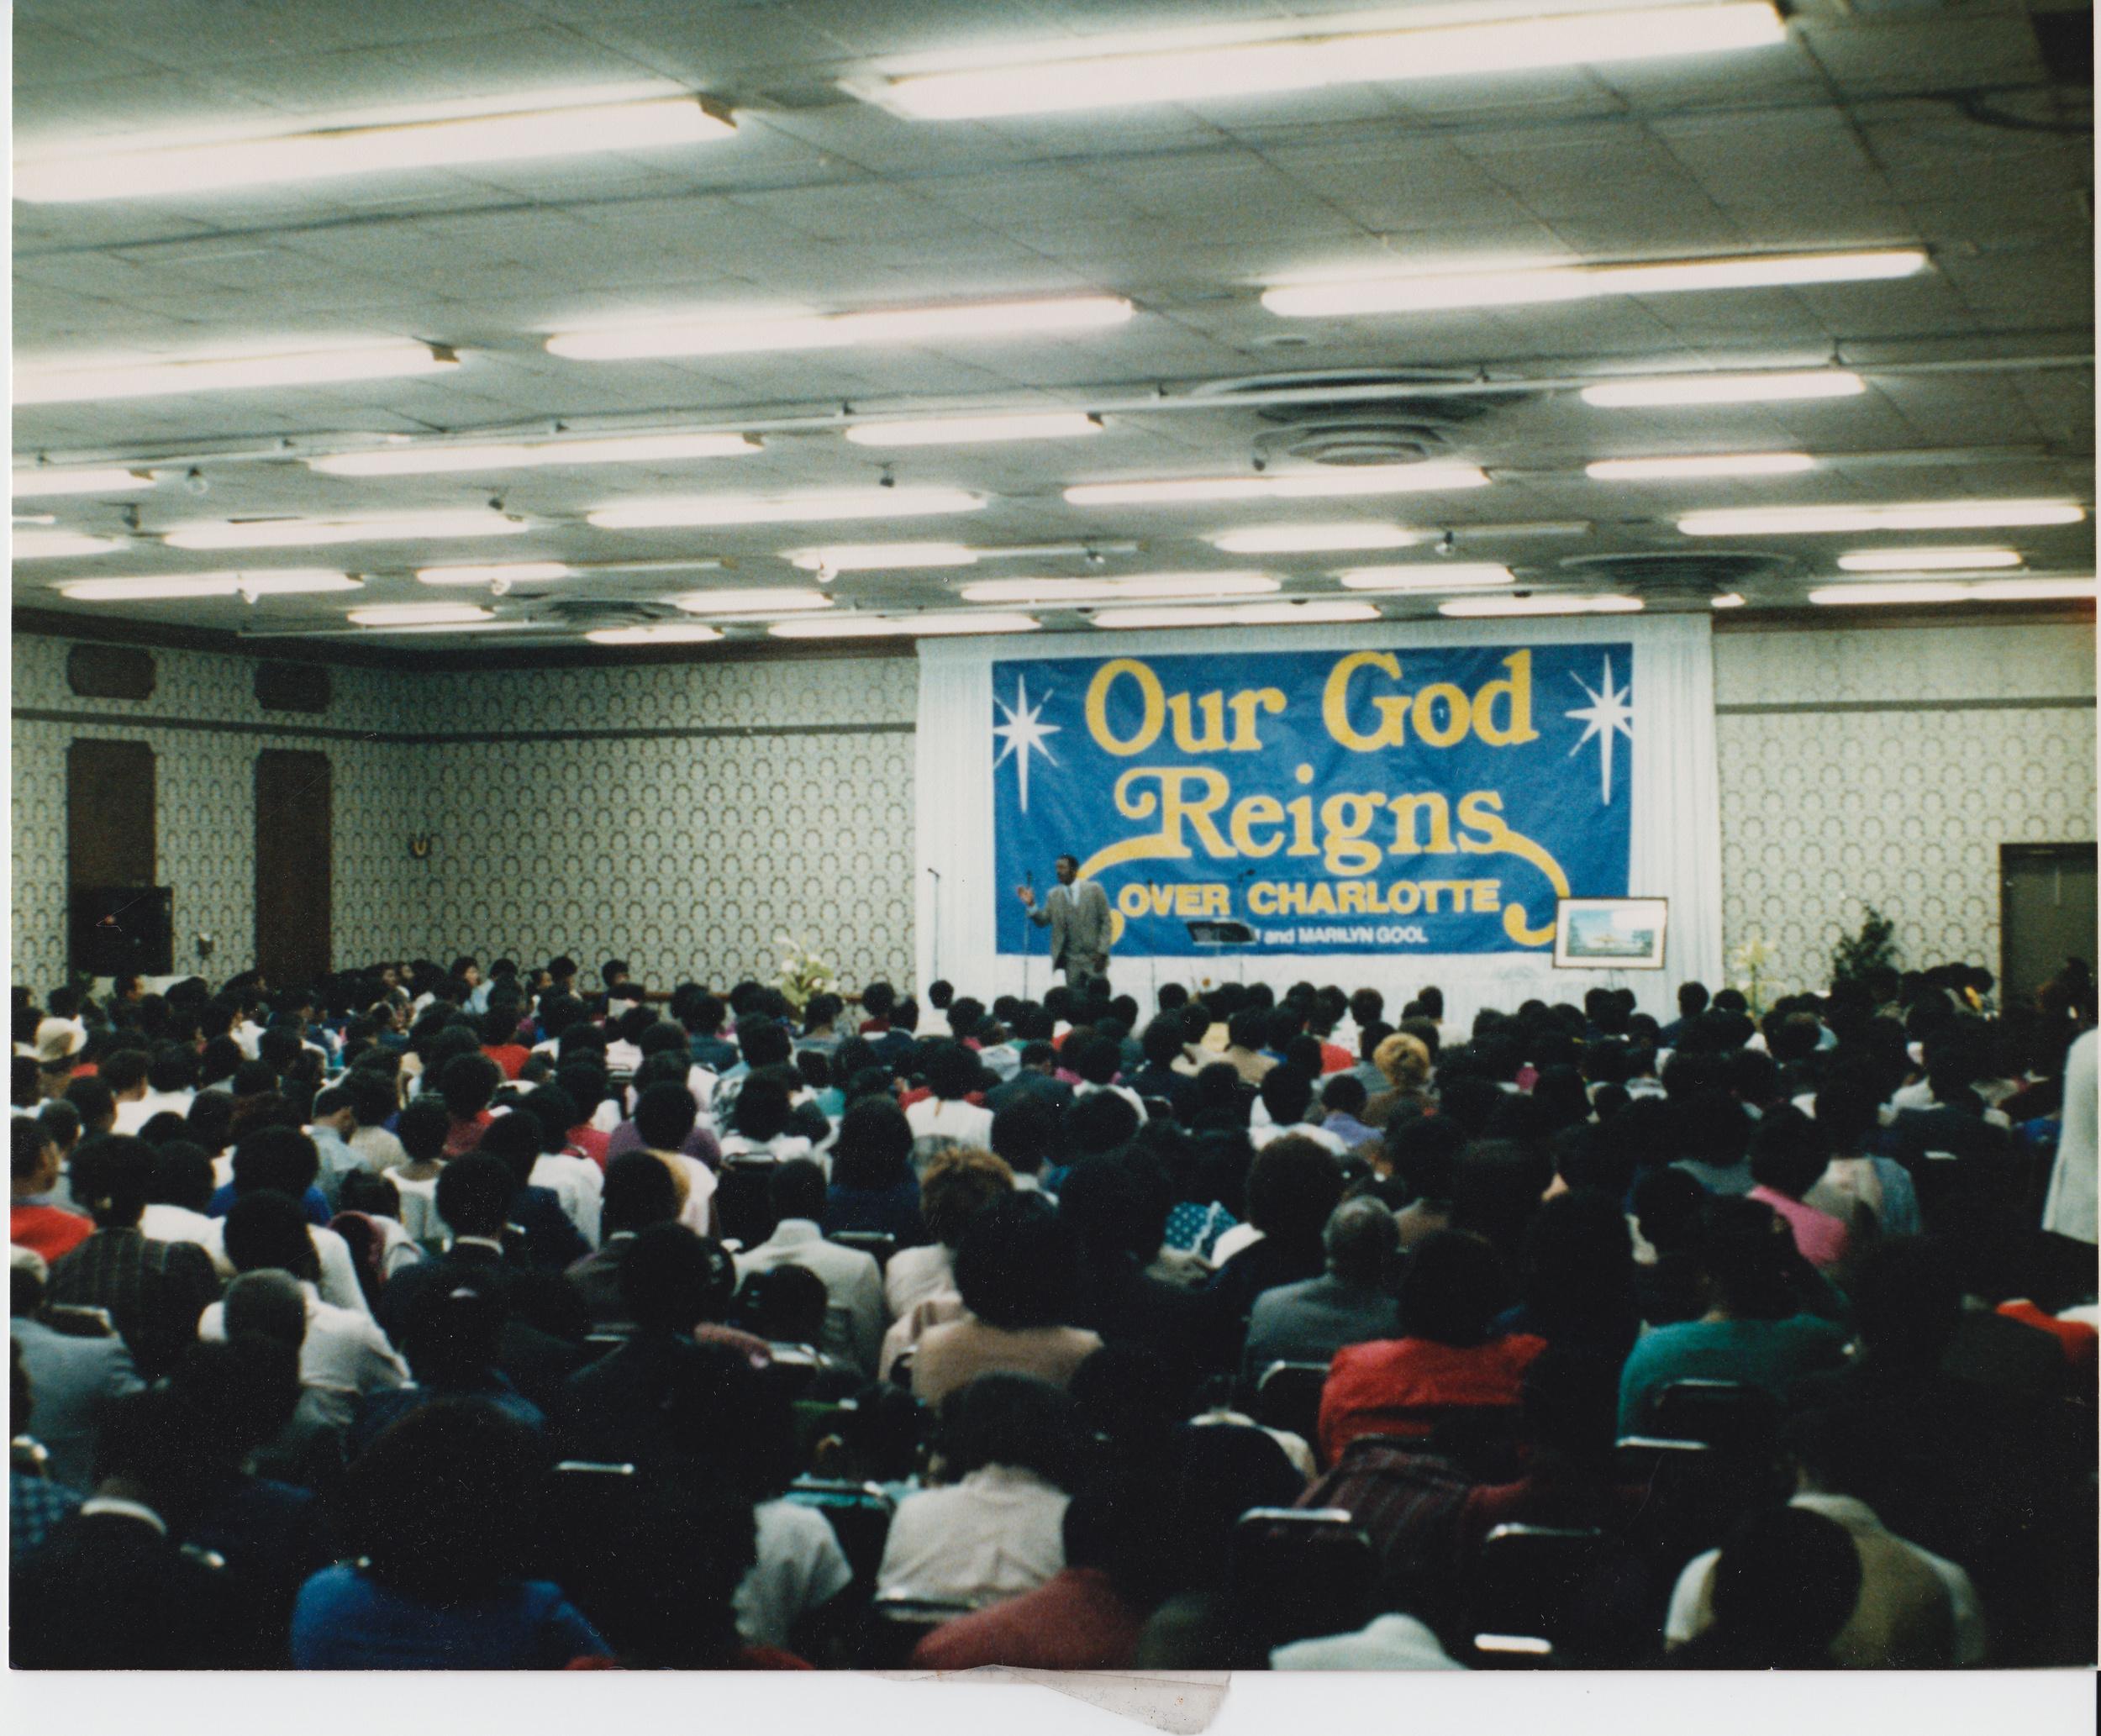 Holiday Inn- Coliseum:  Oct.14, 1980  Holiday Inn North:  Feb. 11, 1981  Holiday Inn Wagoner Hall:  March 1981